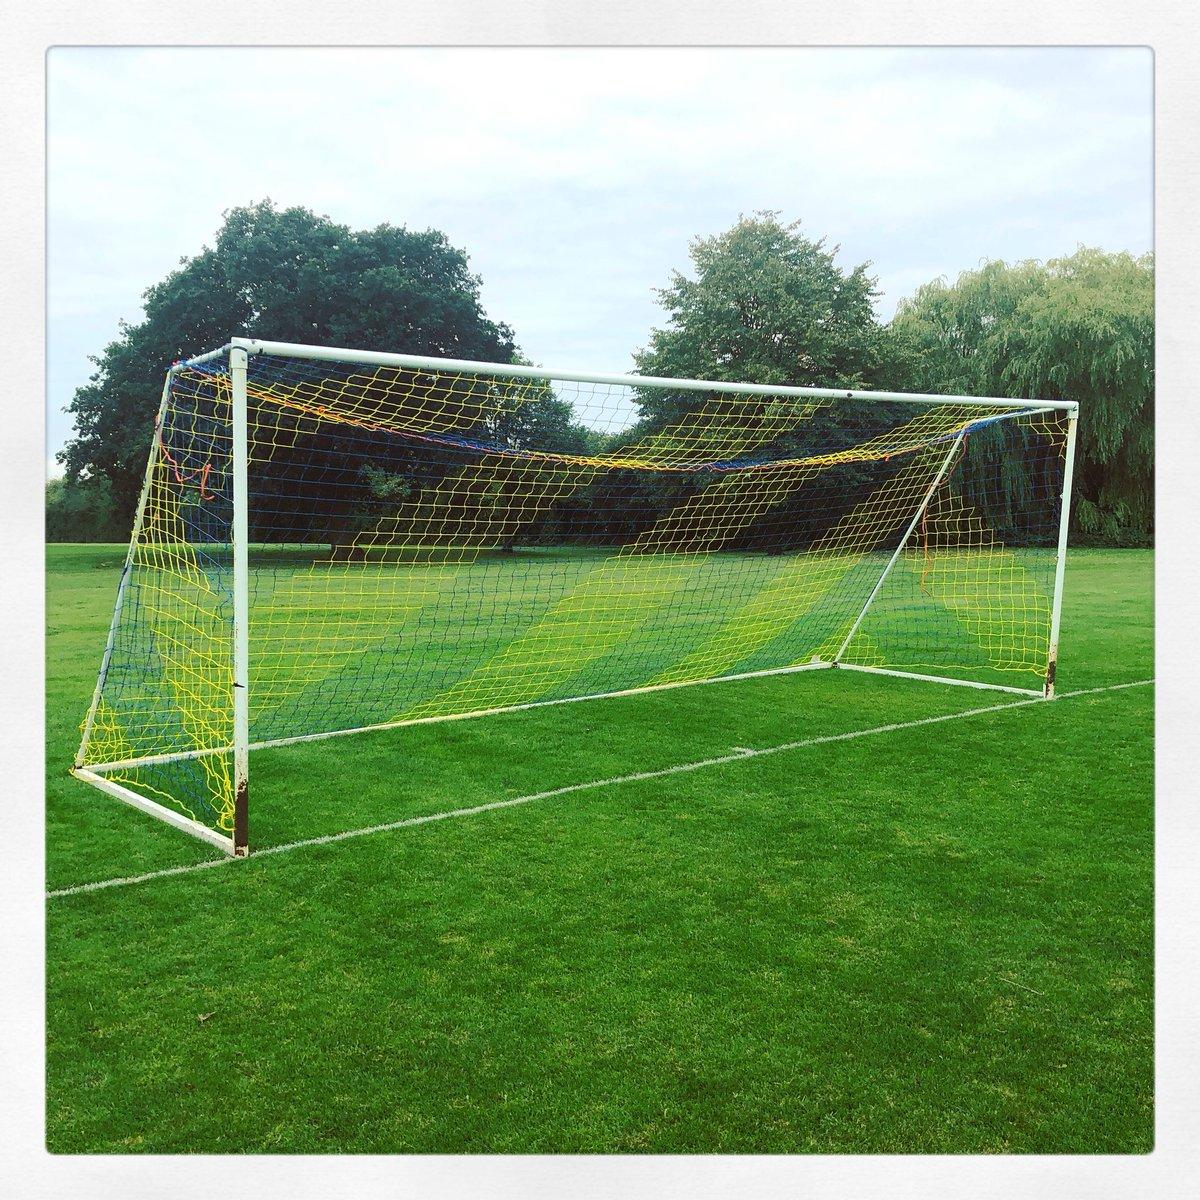 86e540aac Hopefully they will see plenty of goals to the good. #FootballNets #Goals  #TeamColours #ShireOak #Bears #FestivalLeague #Football ...